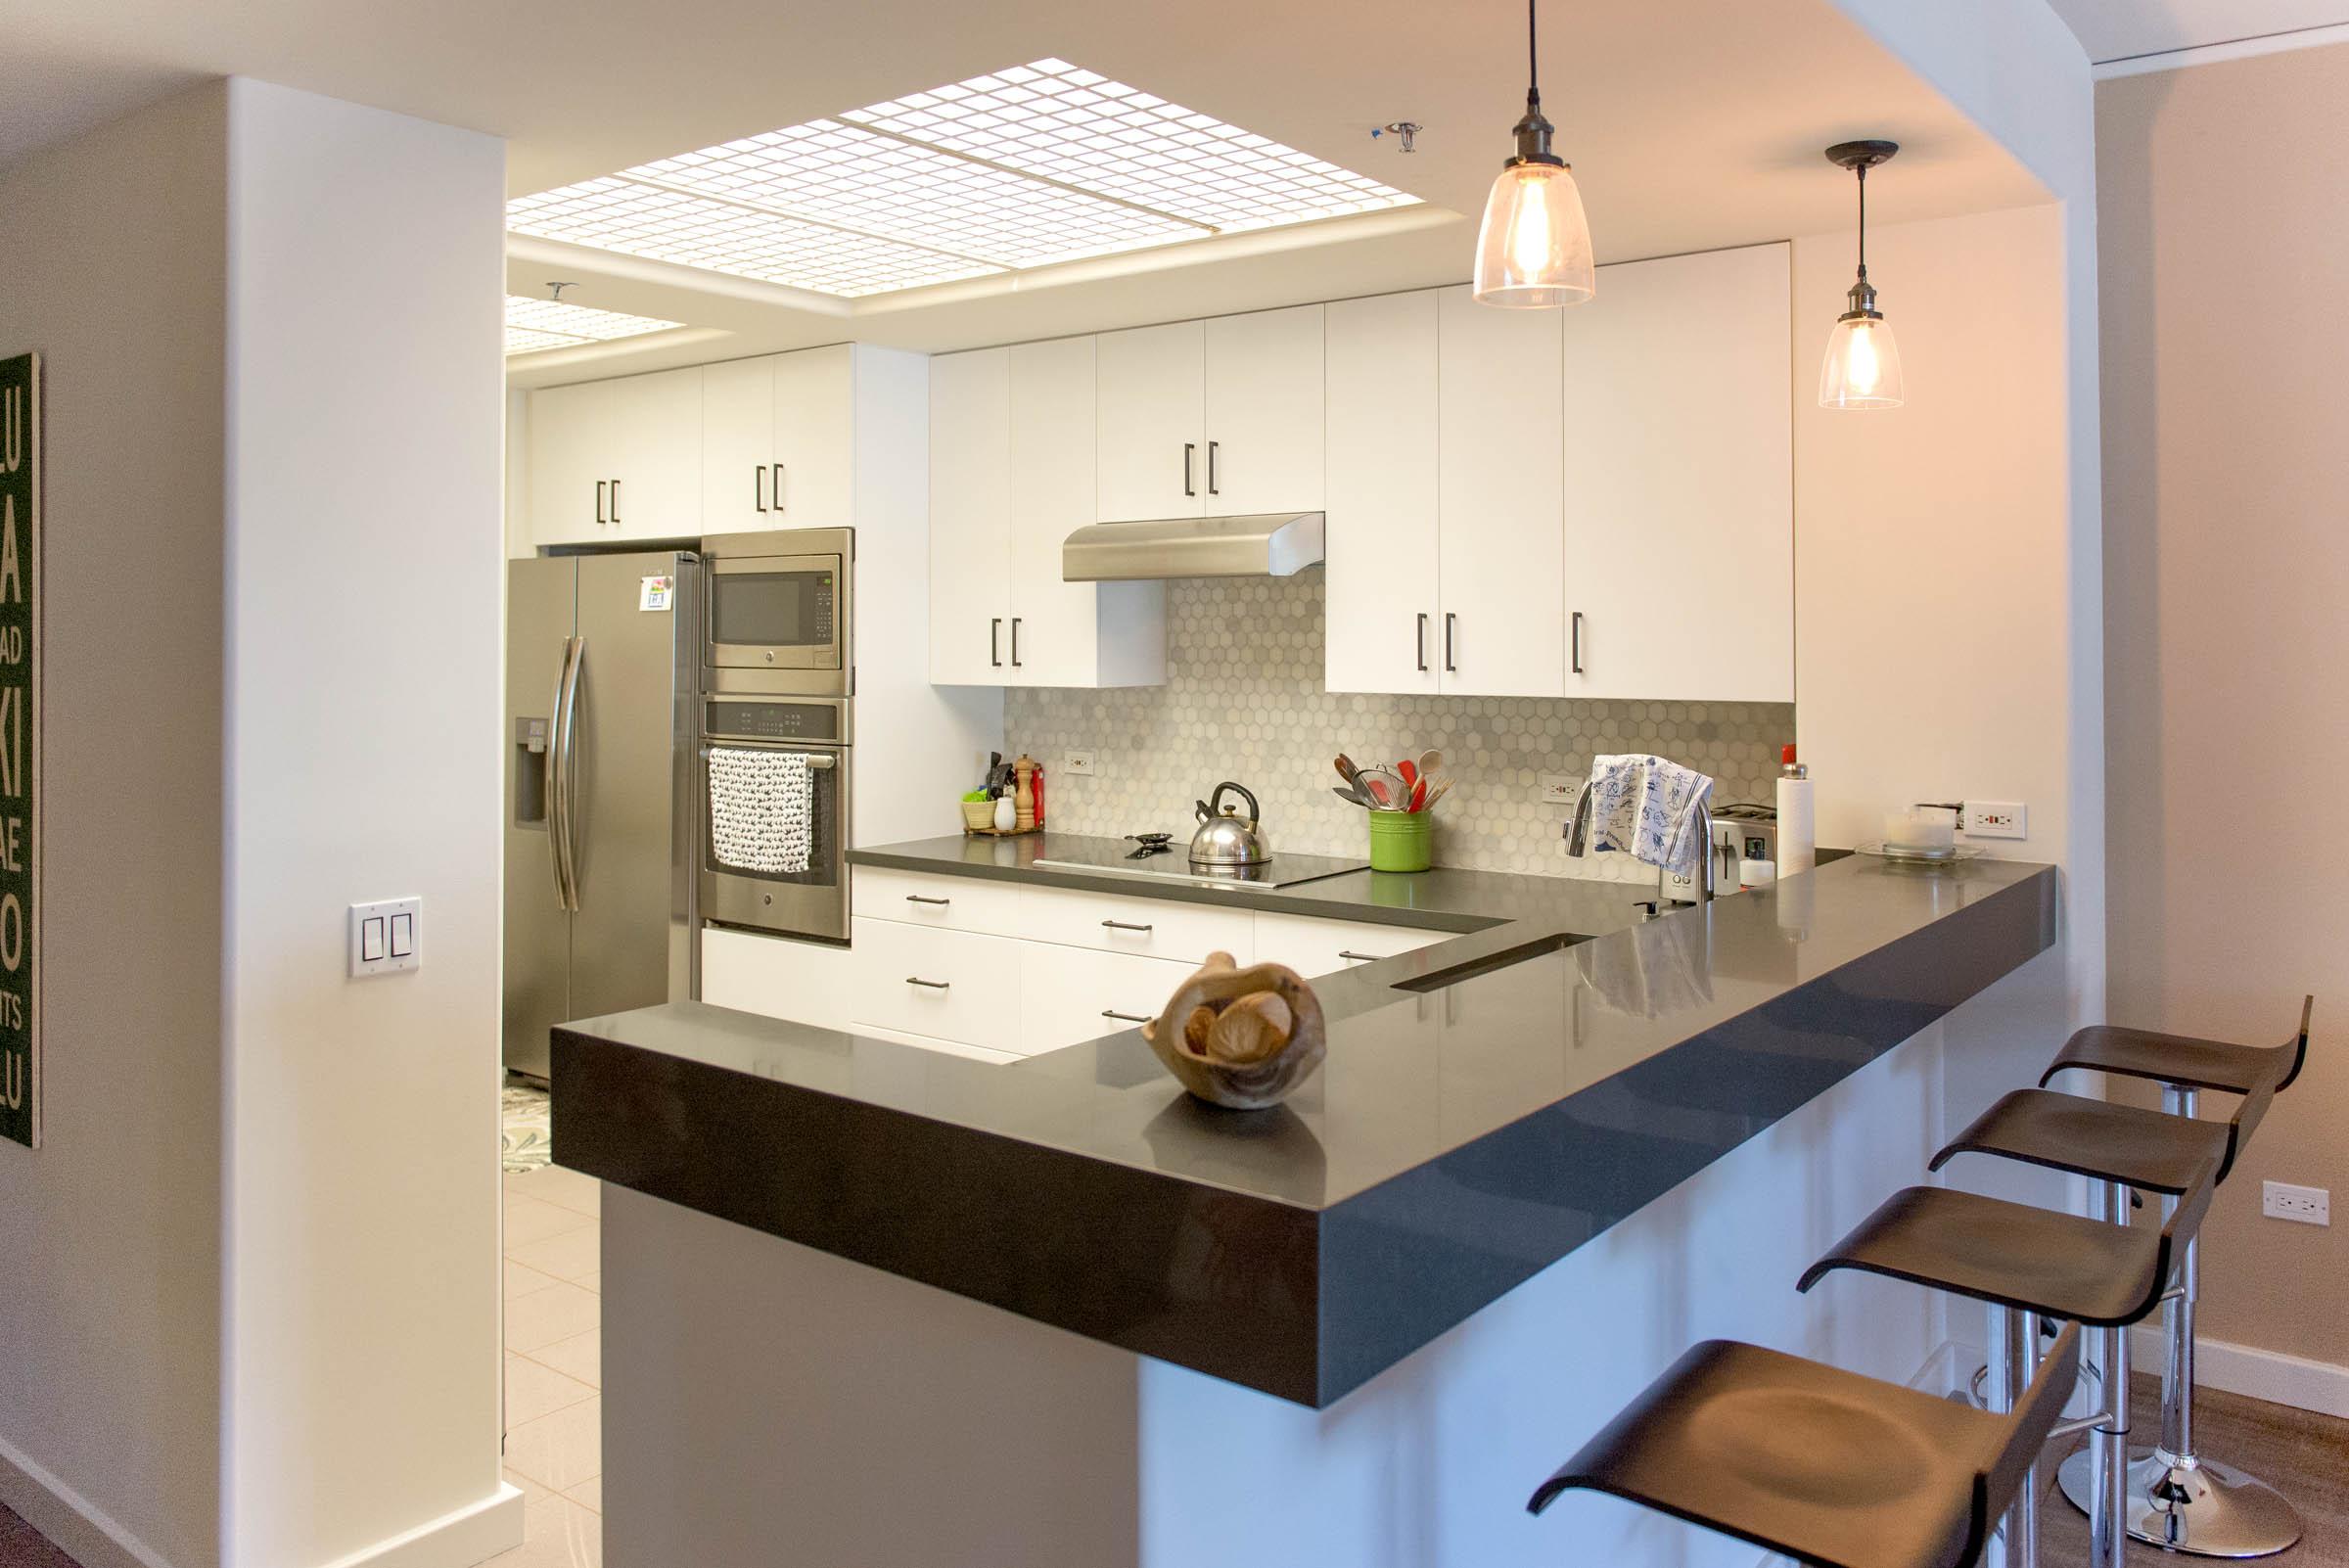 Acquavella design honolulu kitchen and bath designer for Bath remodel honolulu